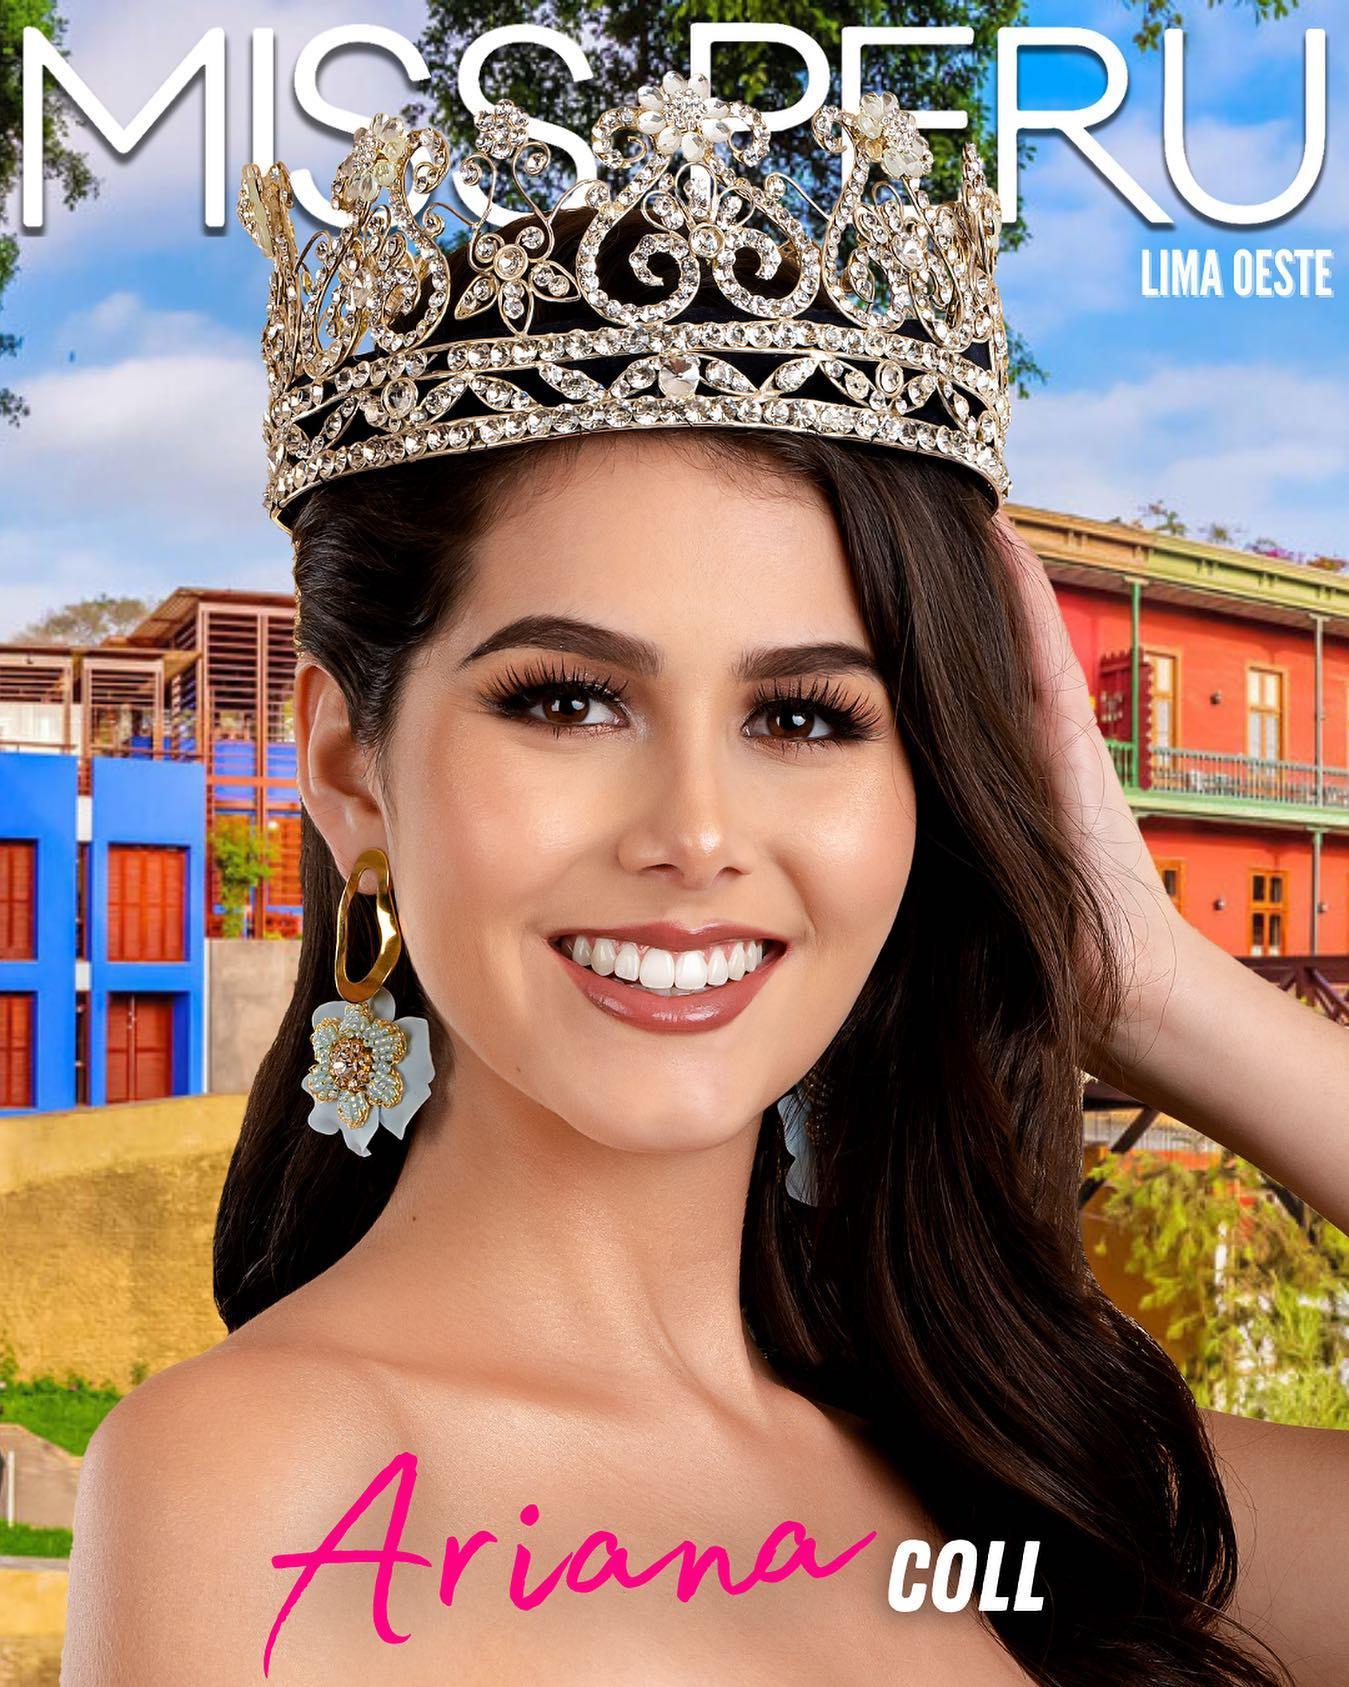 concurso miss peru 2021. top 10 de finalistas: pag 3, 4. top 6: pag. 4. final: 10 oct. - Página 3 RDl8FI